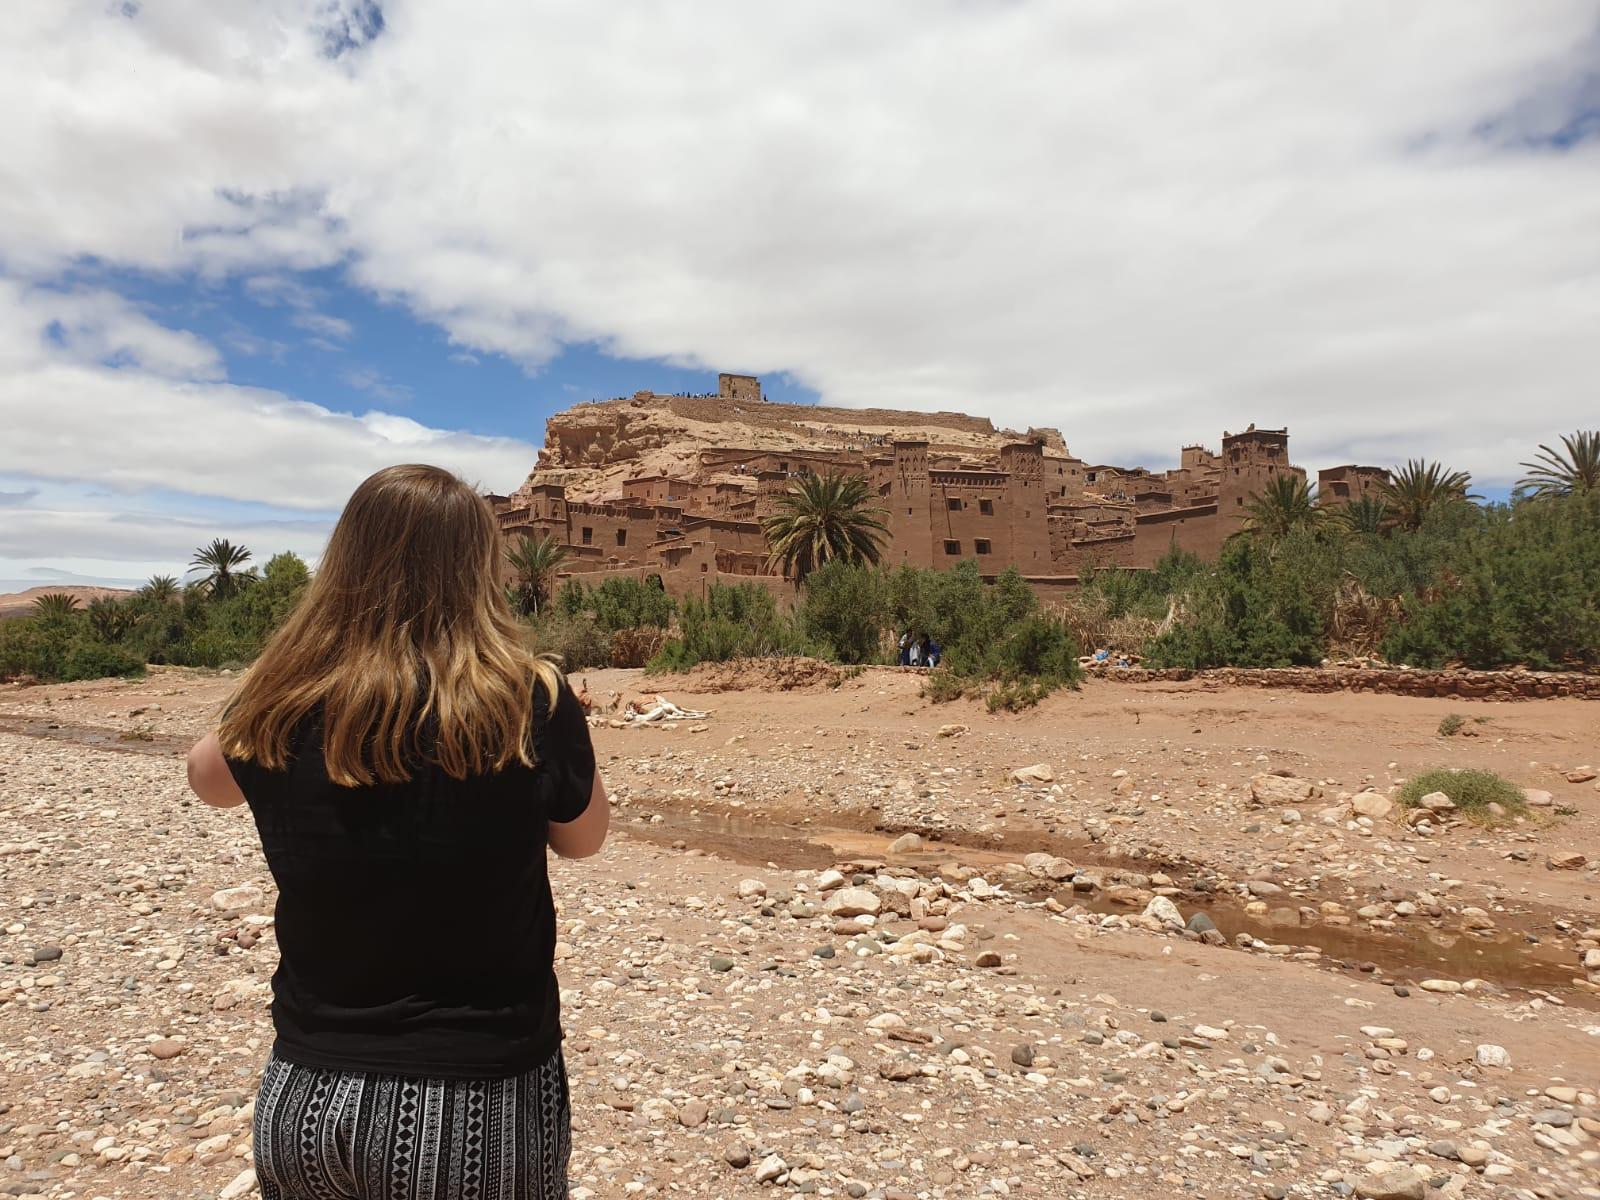 Ait ben haddou in Marokko